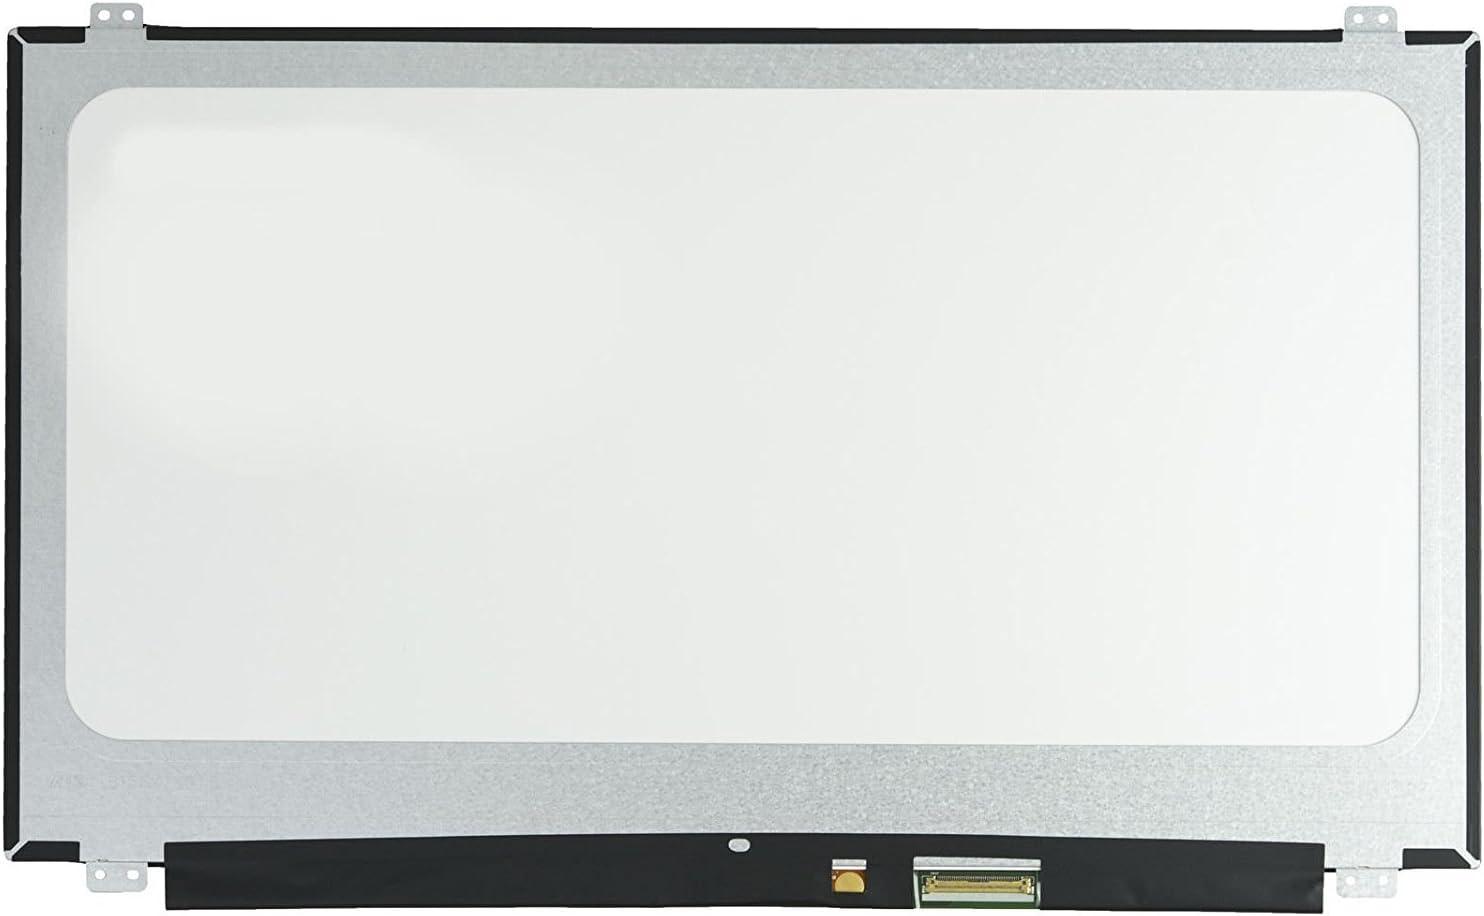 FRU Part Number 00UR885 00UR886 SD10L82810 15.6 FHD LED LCD Screen